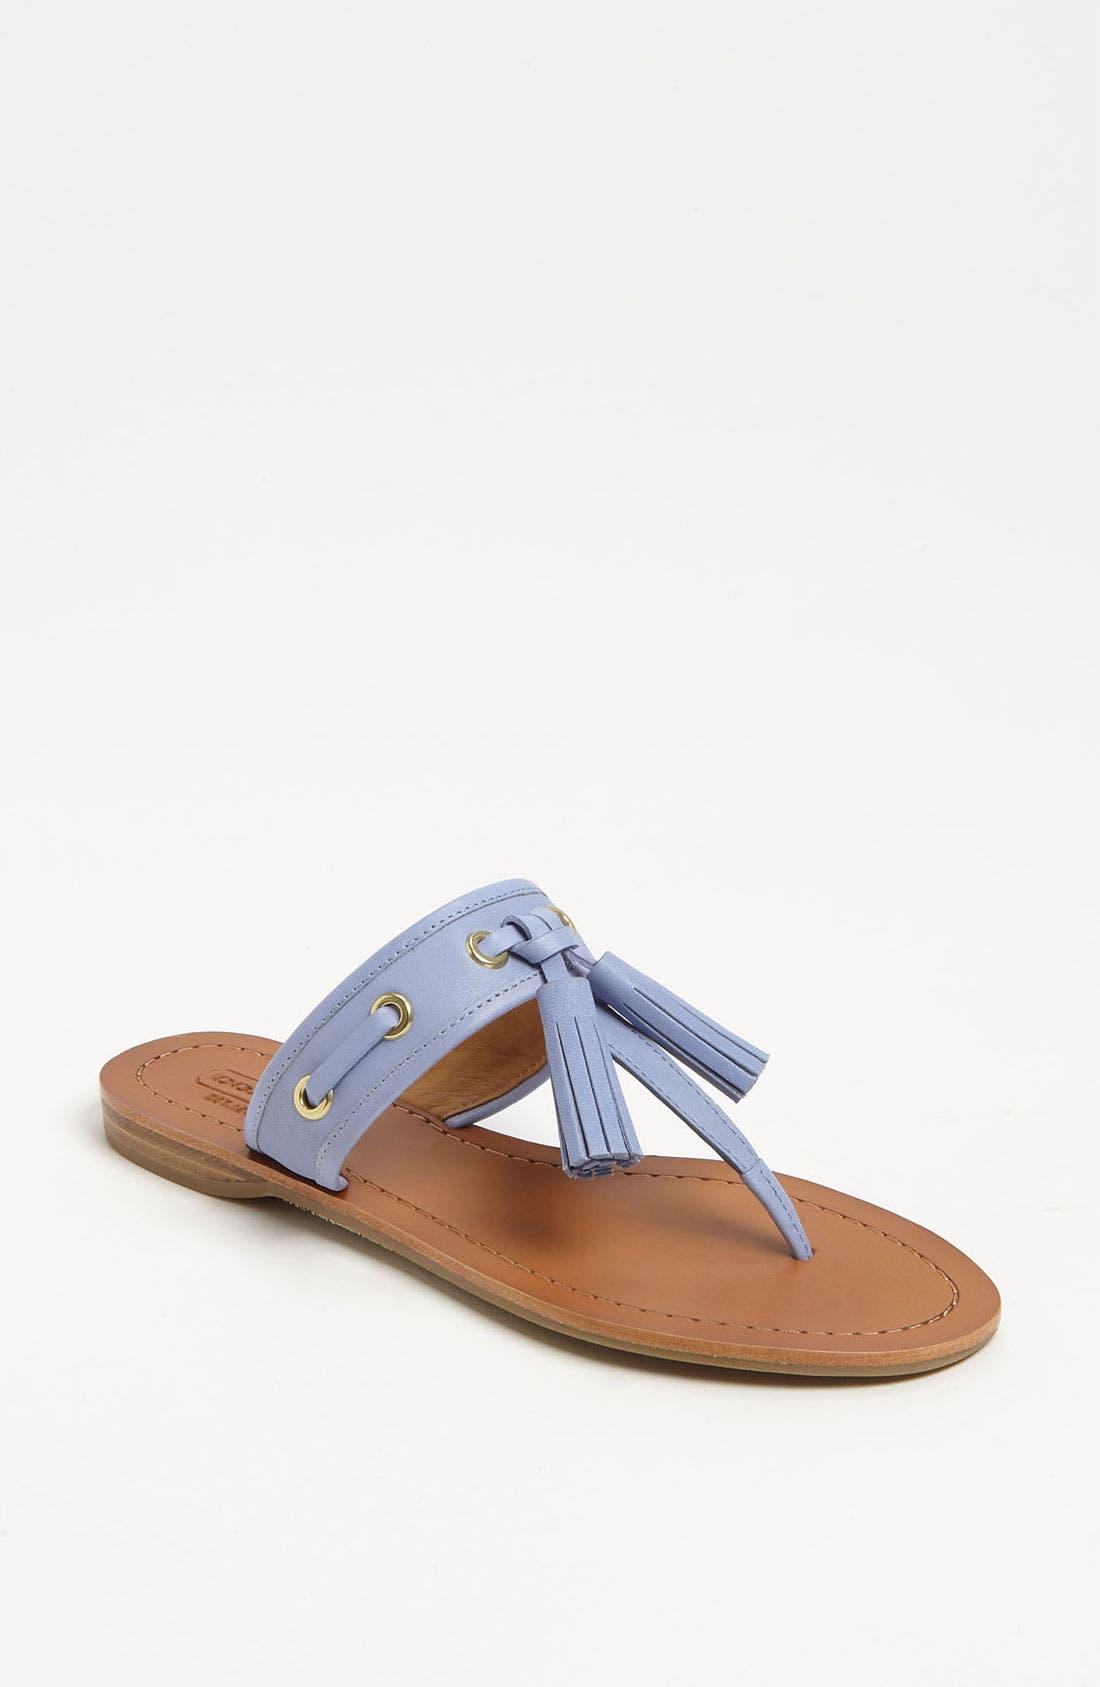 Main Image - COACH 'Sheena' Sandal